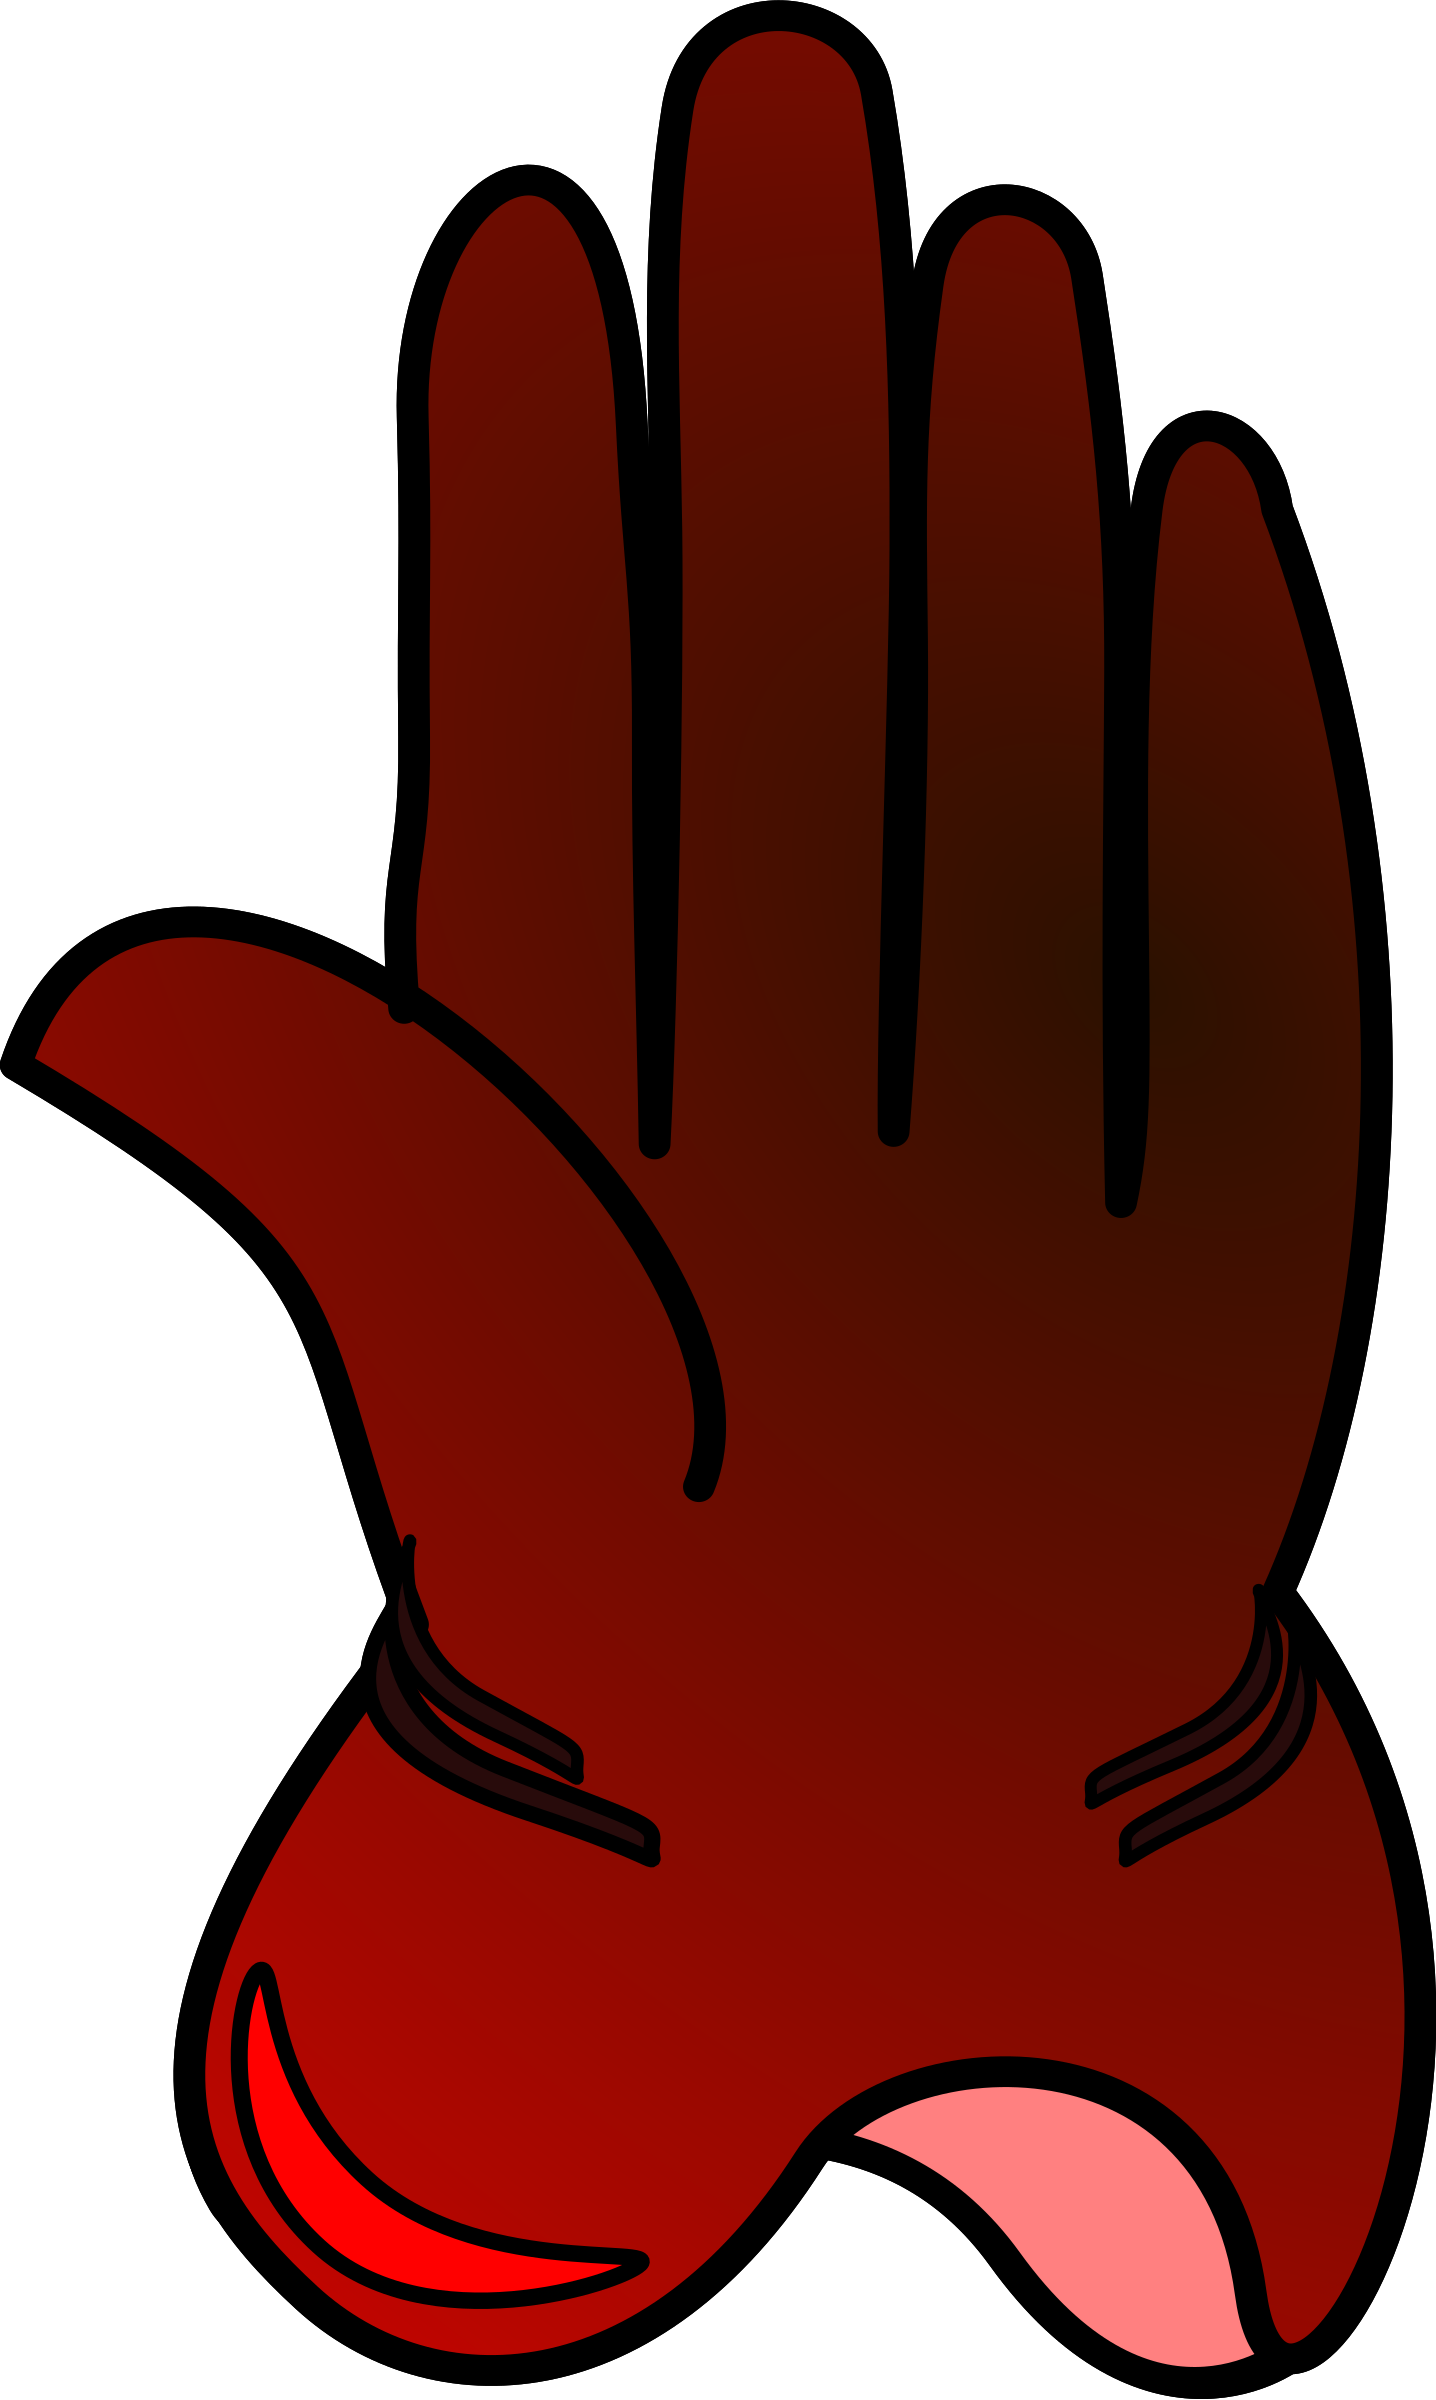 Glove clipart animated Clipart glove glove